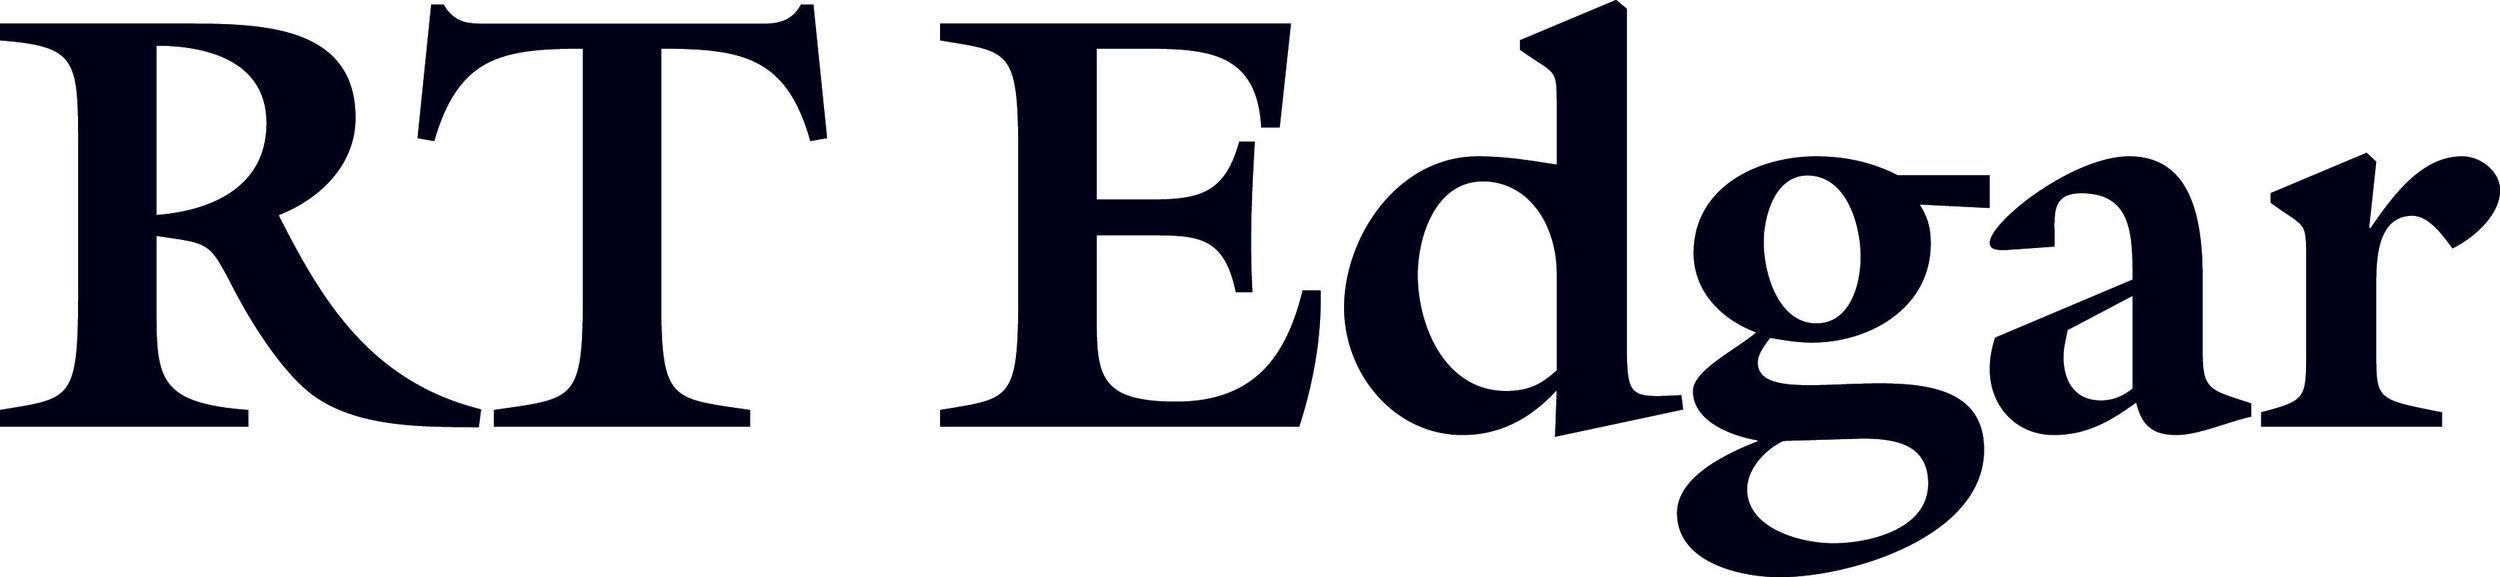 RT Edgar Logo Large.jpg